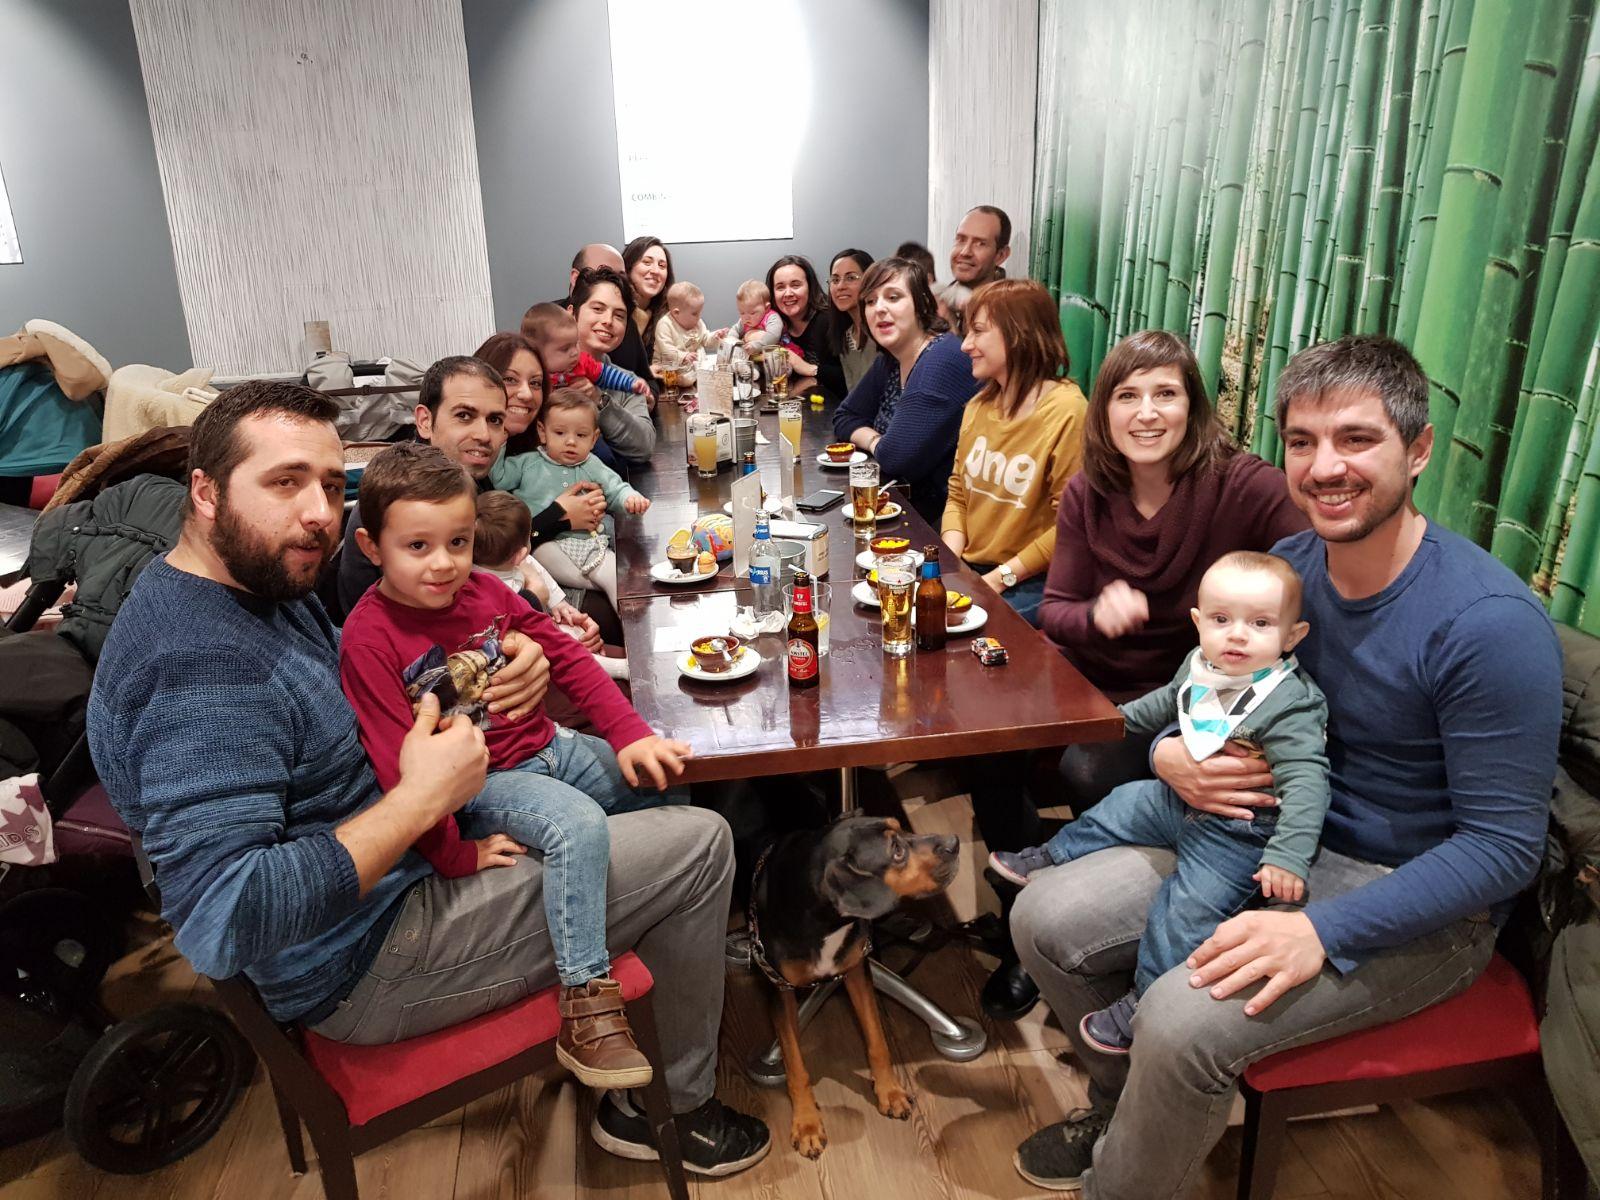 REUNION ESPONTANEA I3 MARZO 2018